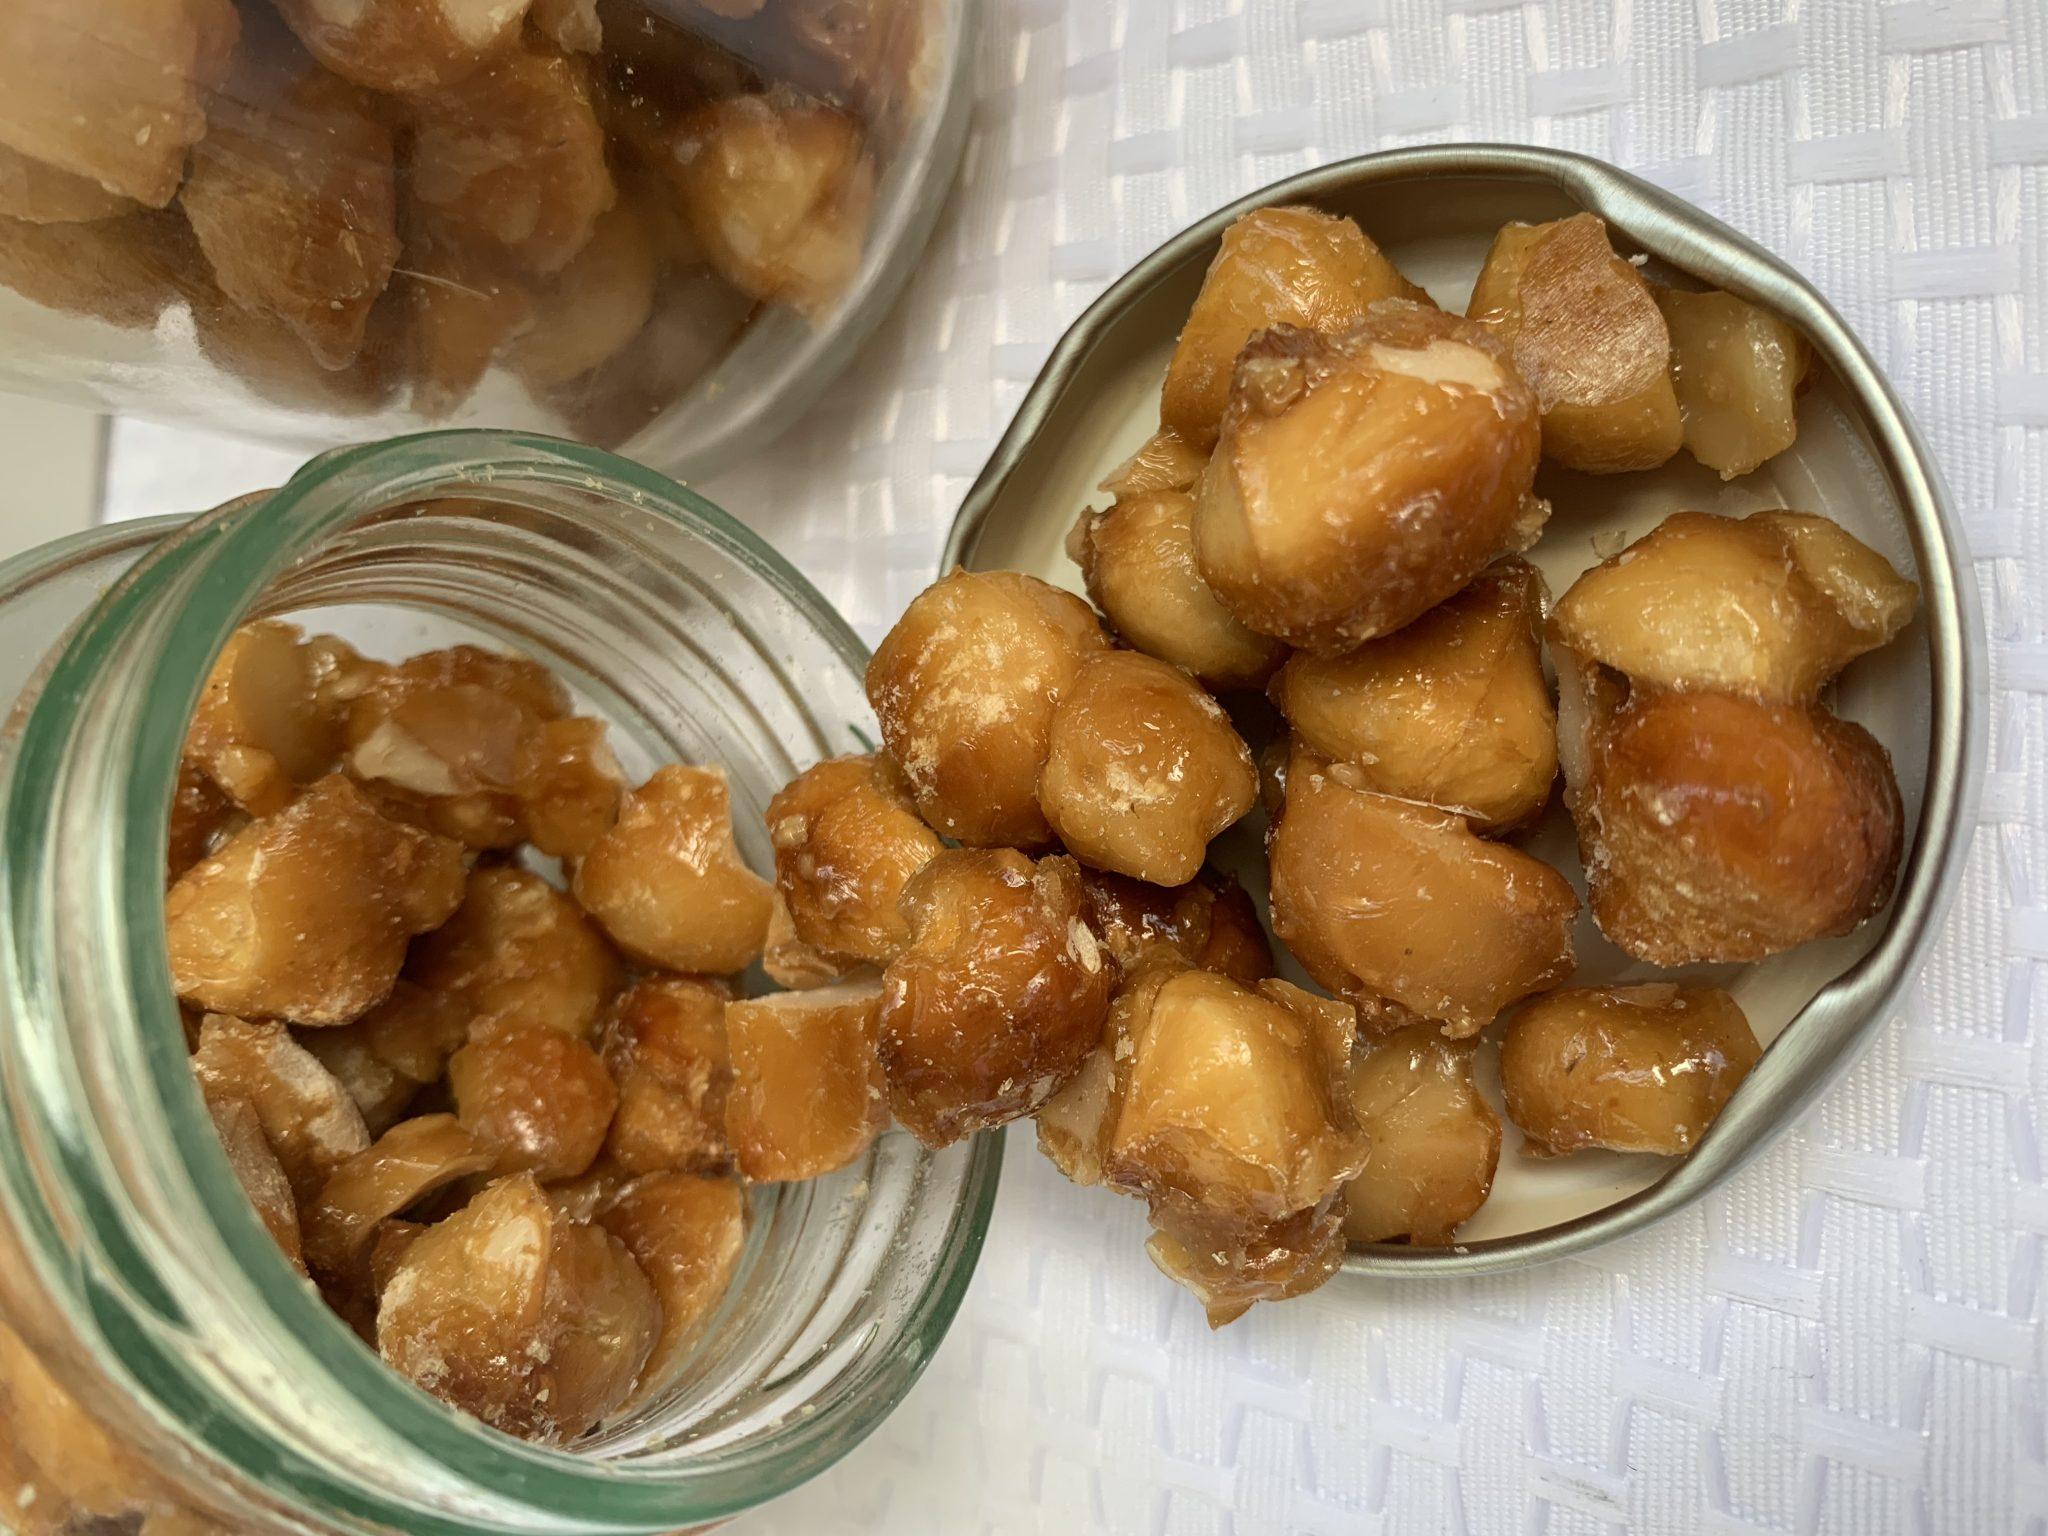 Thermomix Roasted Macadamia Nuts